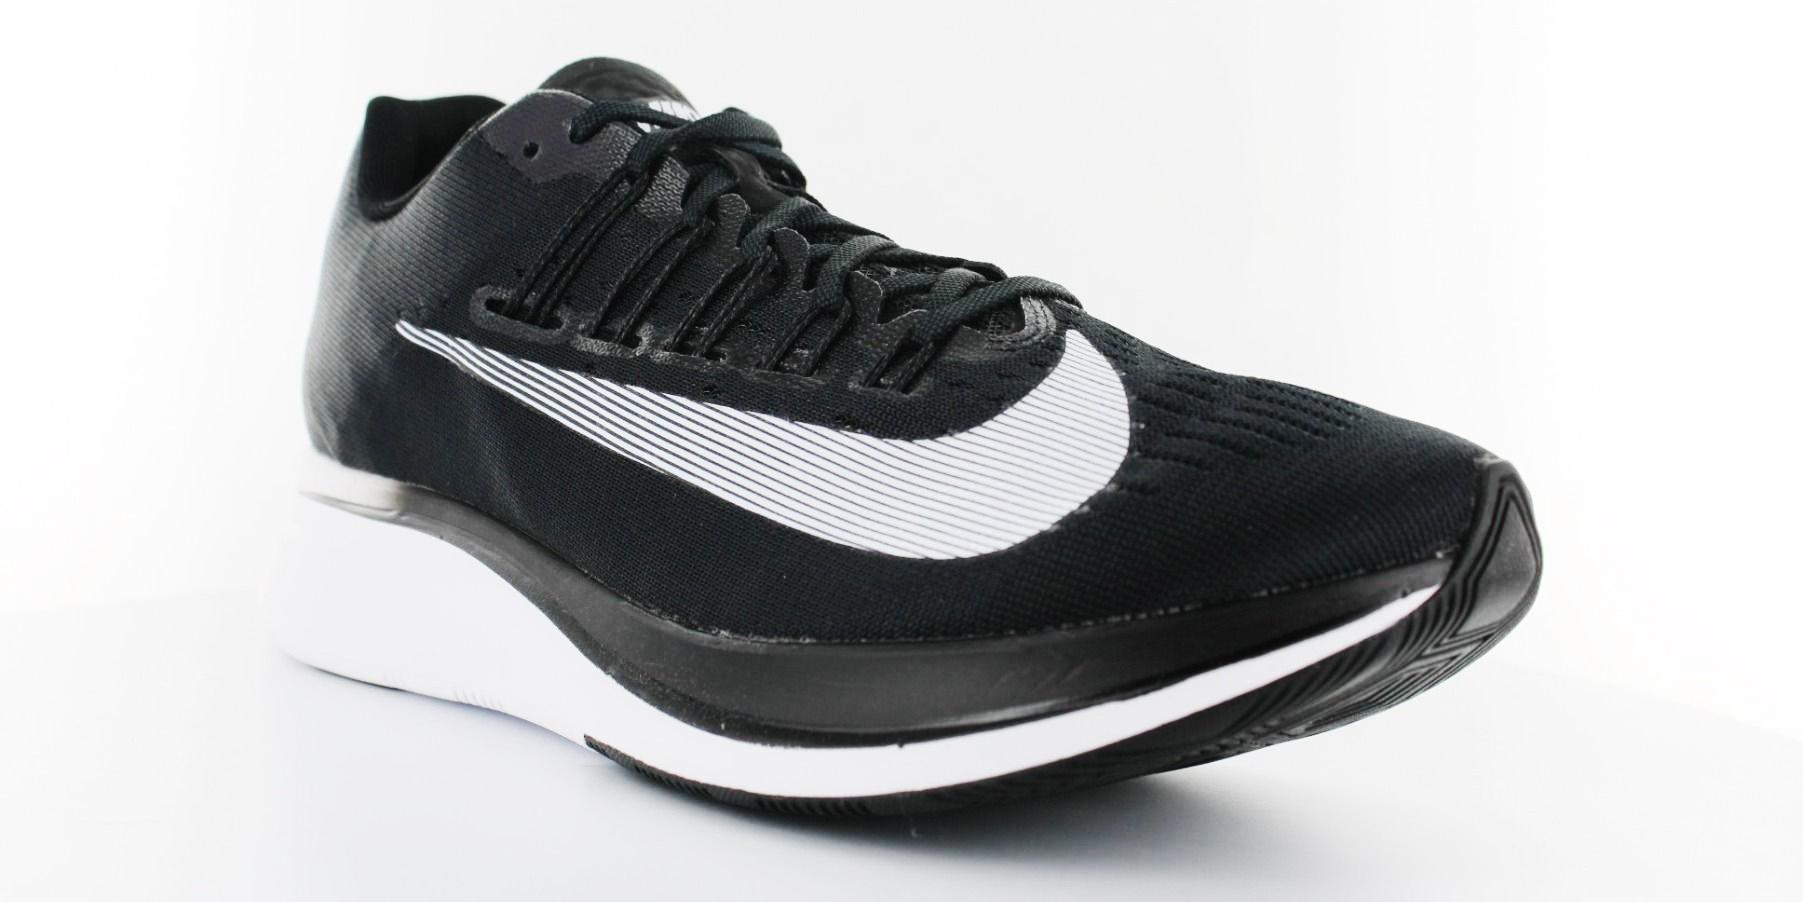 fantasma attributo vestito  Nike Zoom Fly Review: Fit, Feel & Function | Kintec Shoe Experts